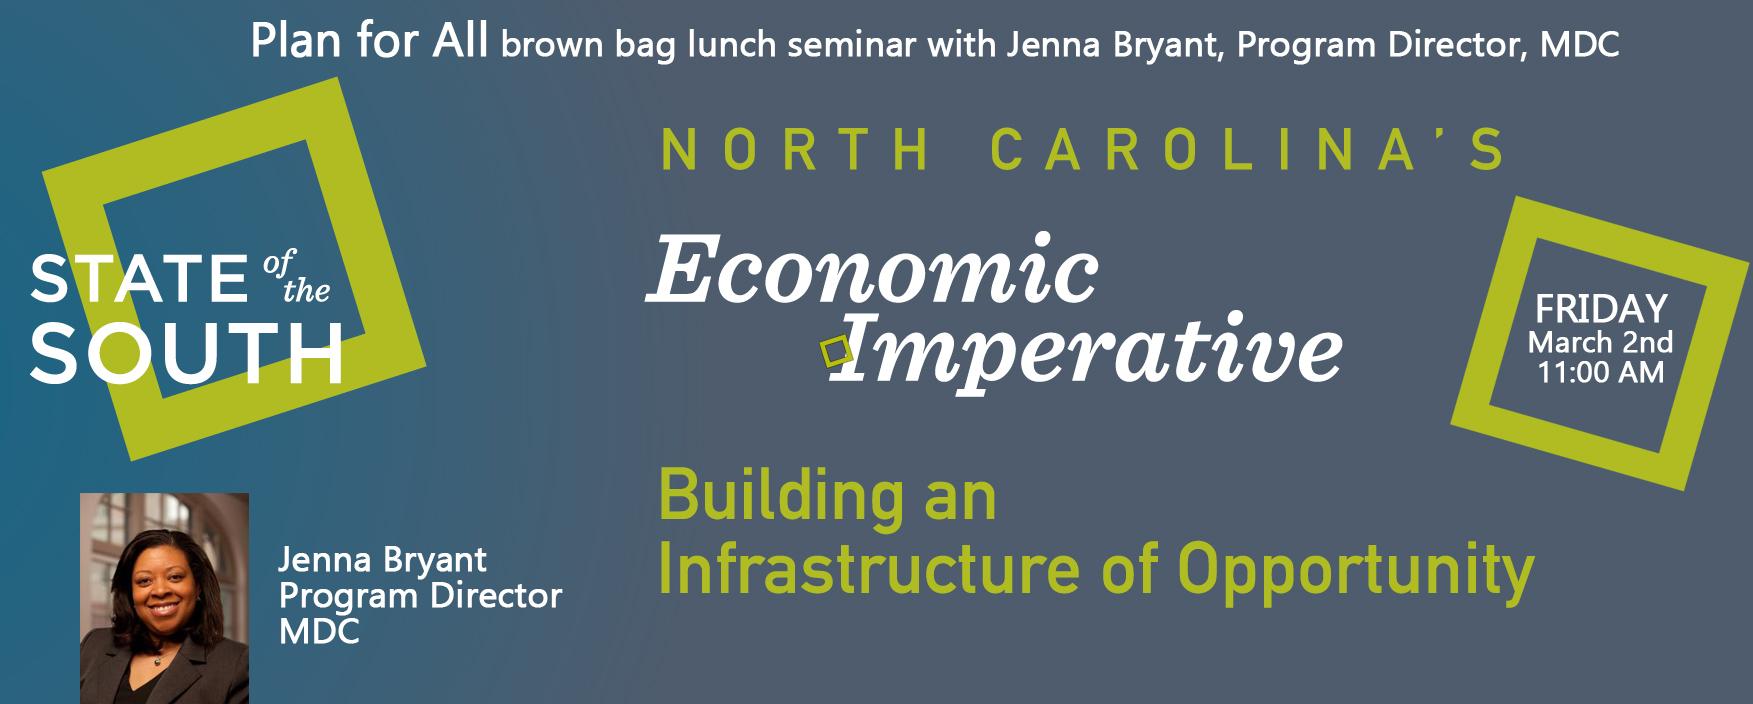 Event flyer - Jenna Bryant, MDC